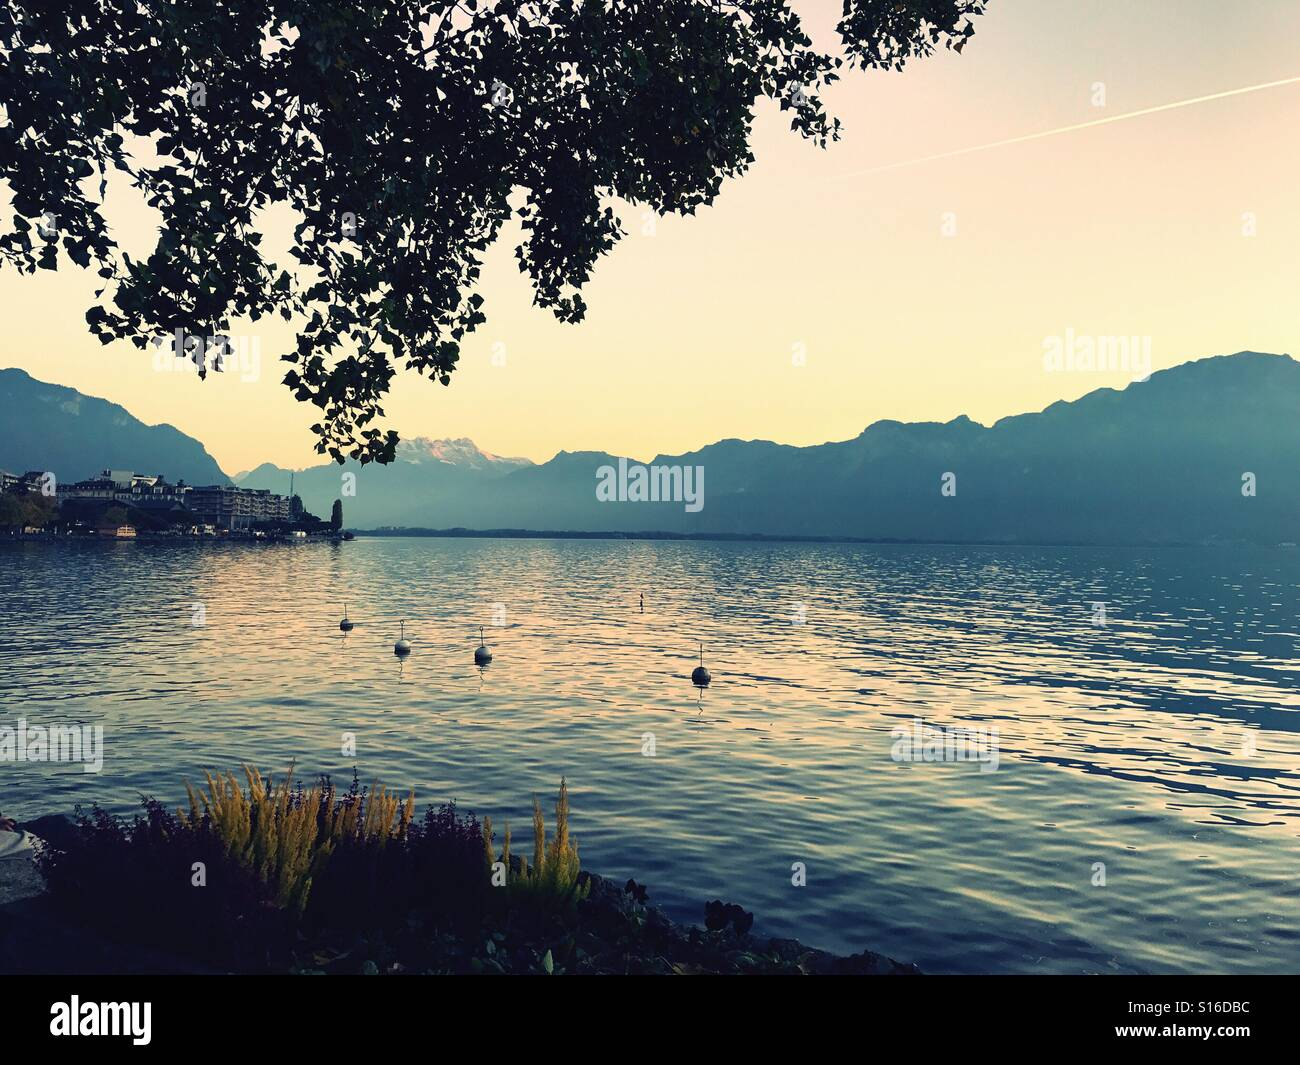 Lake Leman Switzerland - Stock Image